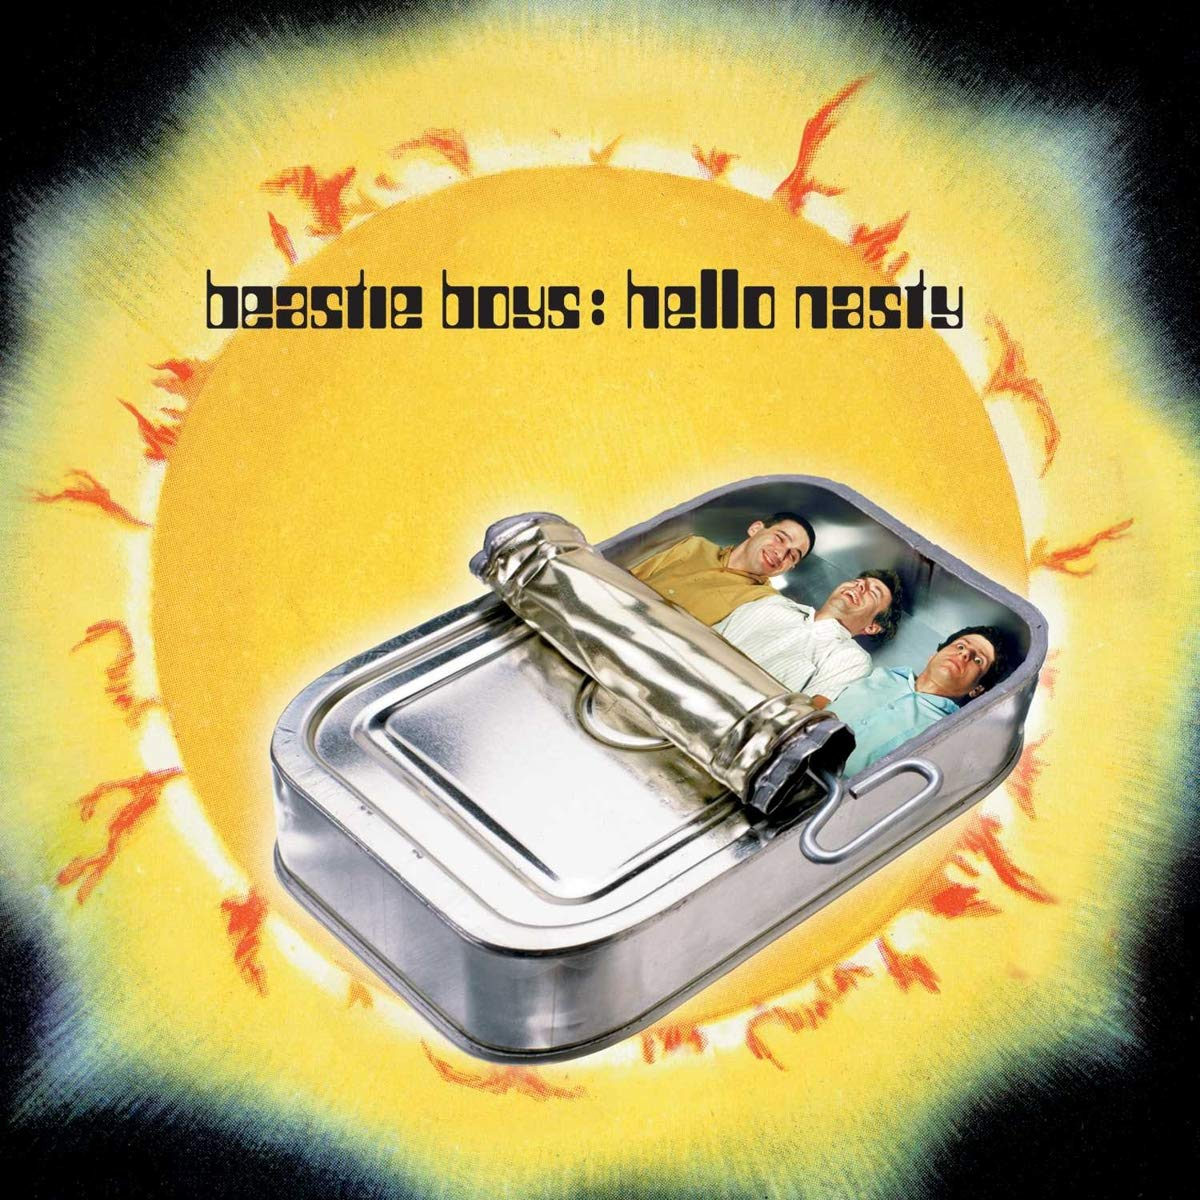 Beastie Boys - Hello Nasty (2009) [FLAC] Download